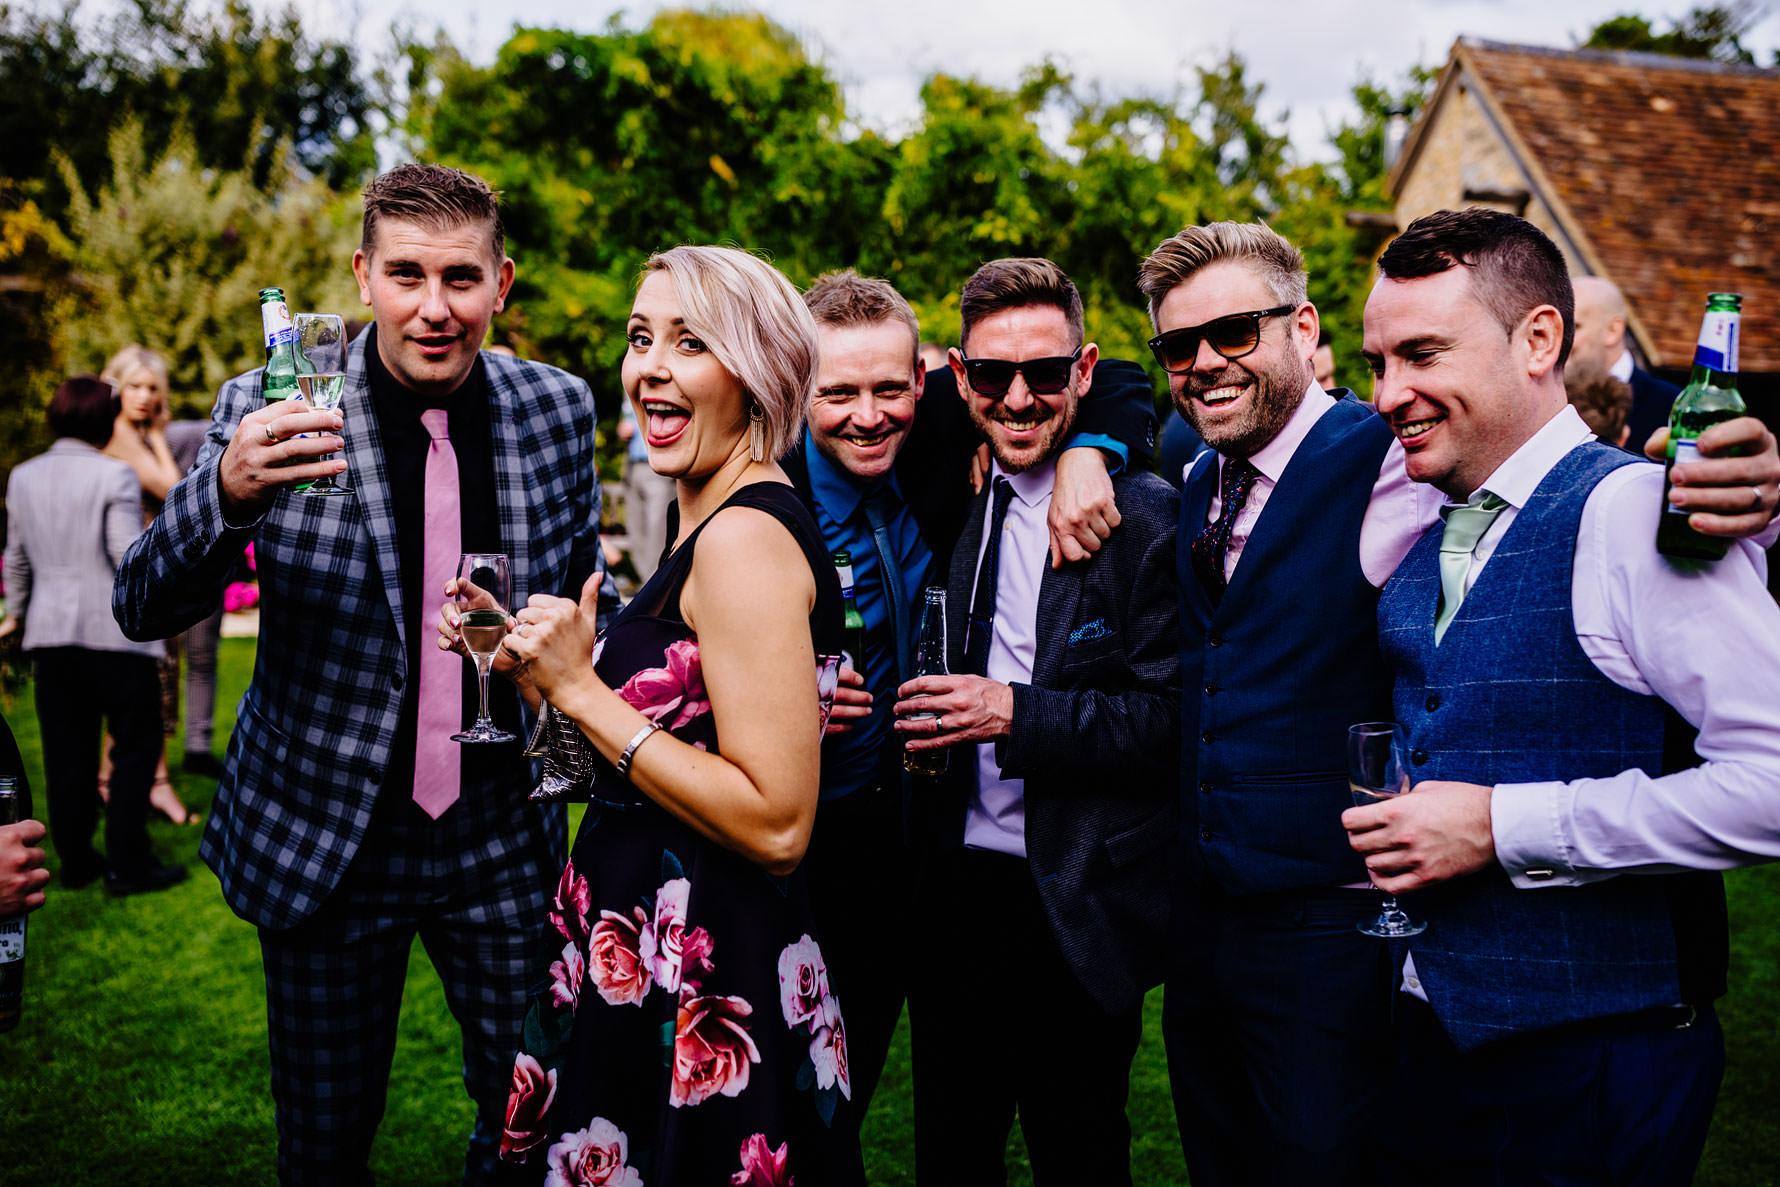 a funny wedding image